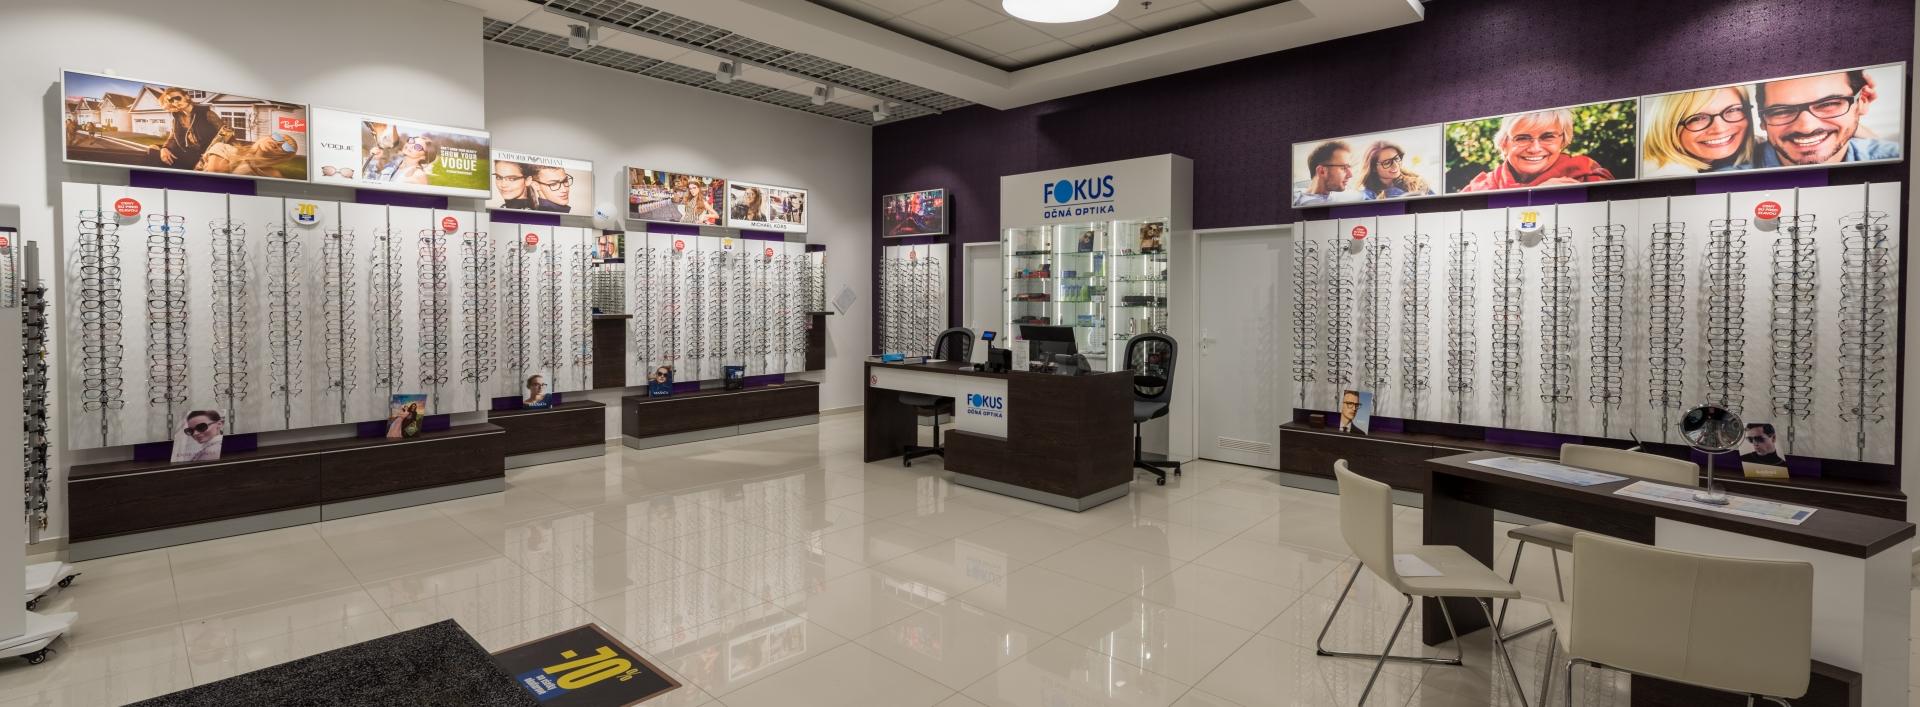 835d9b5db FOKUS očná optika | Eperia - Shopping mall